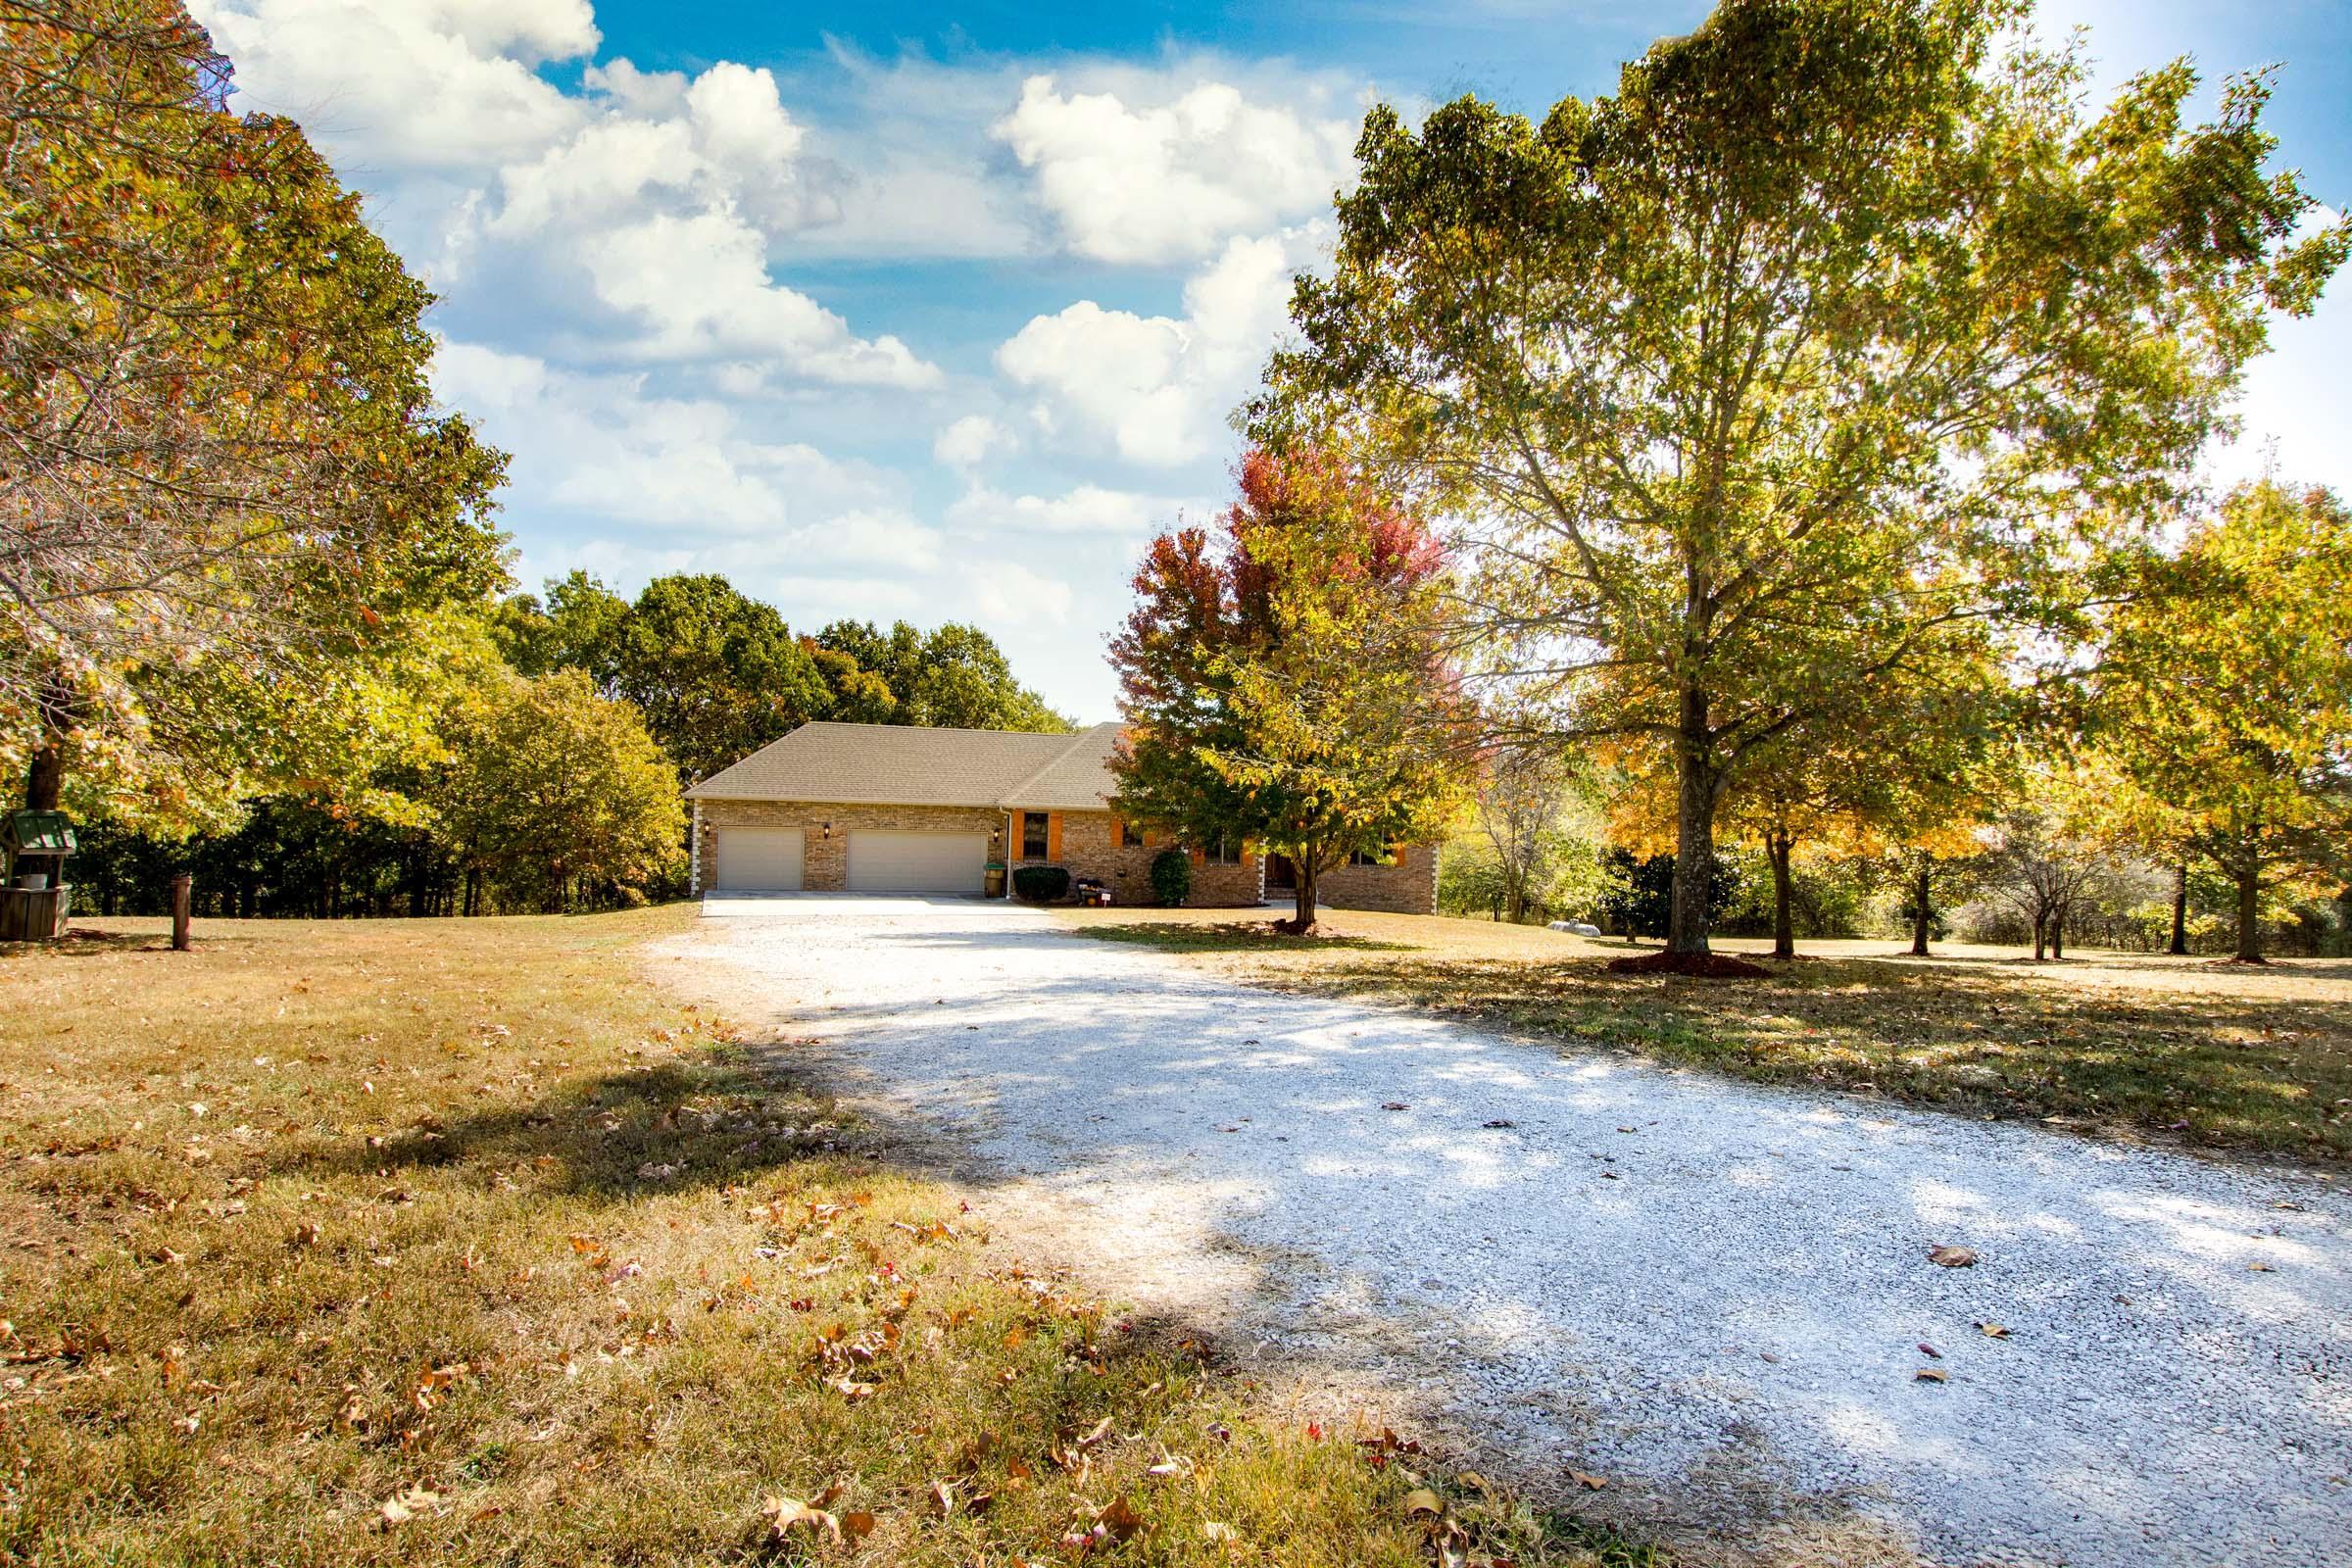 3874 North Farm Rd 79 Willard, MO 65781